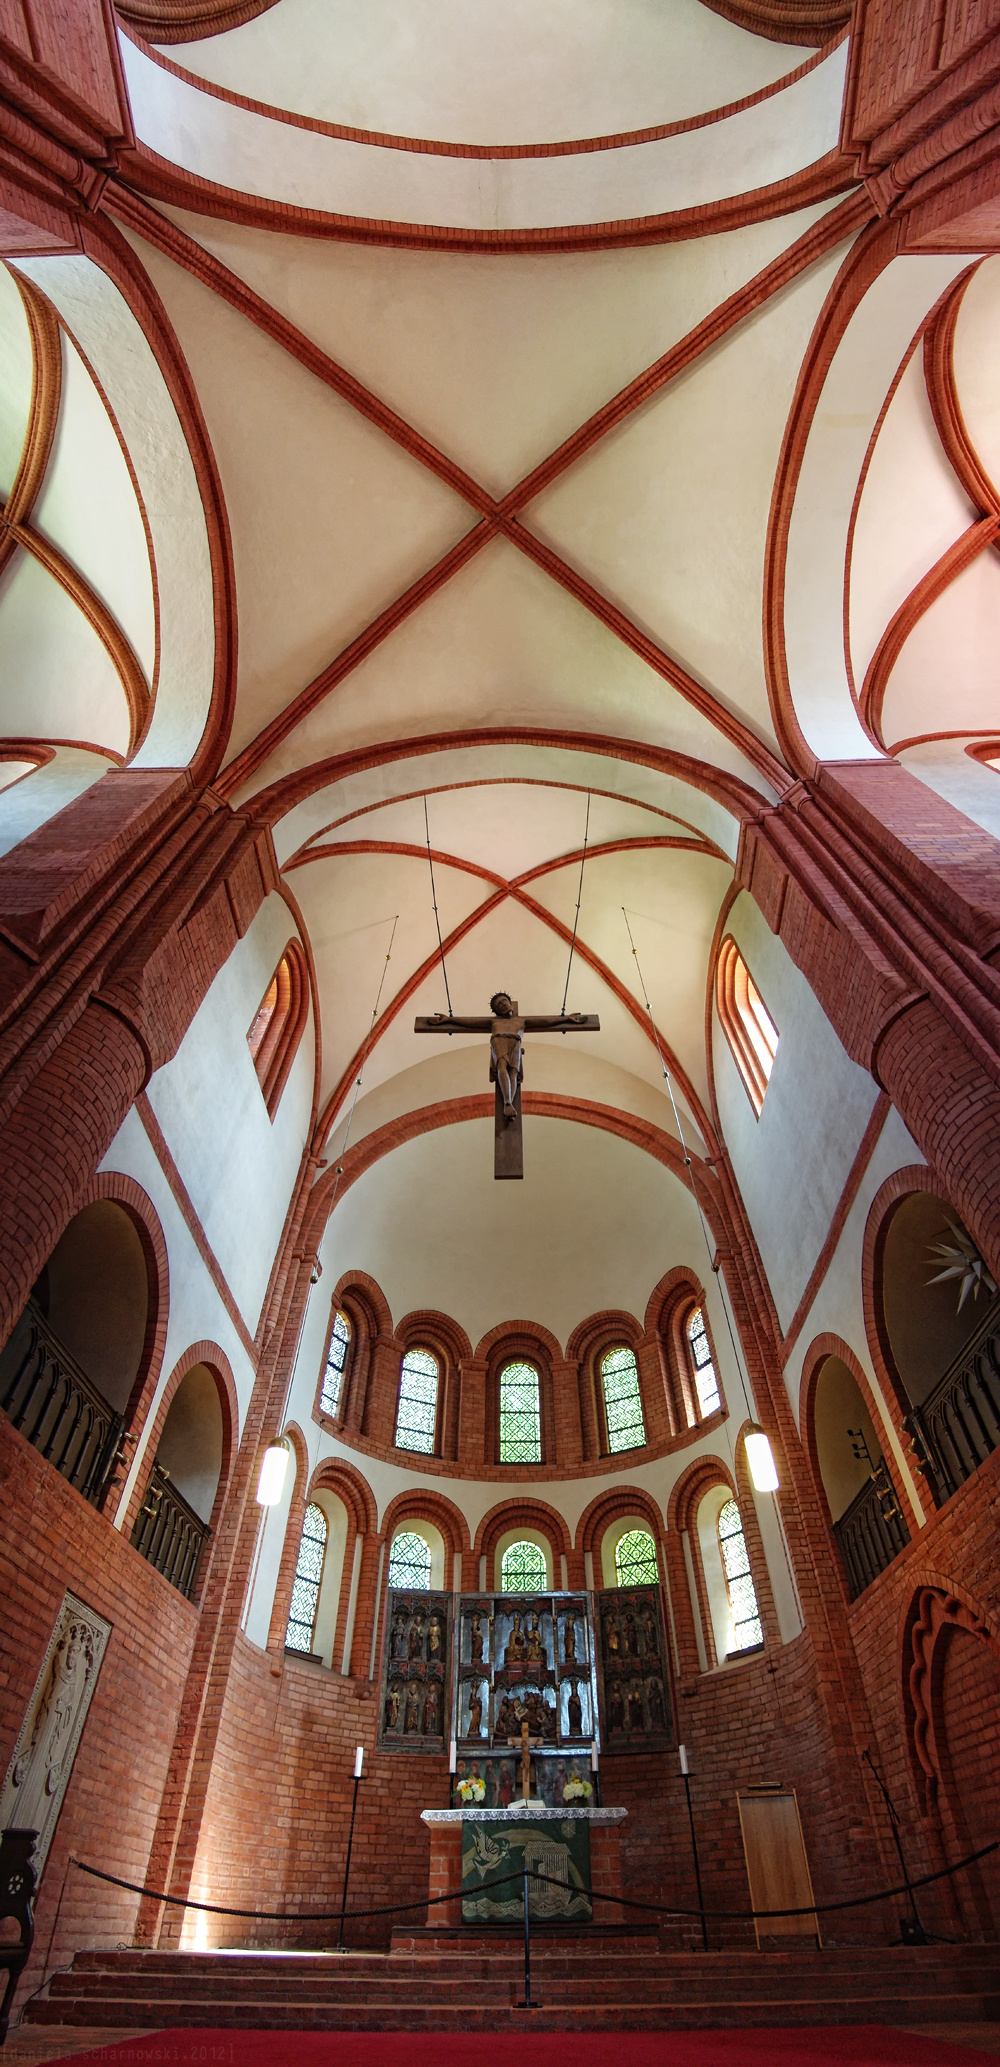 St. Mary of Lehnin Abbey, Apsis